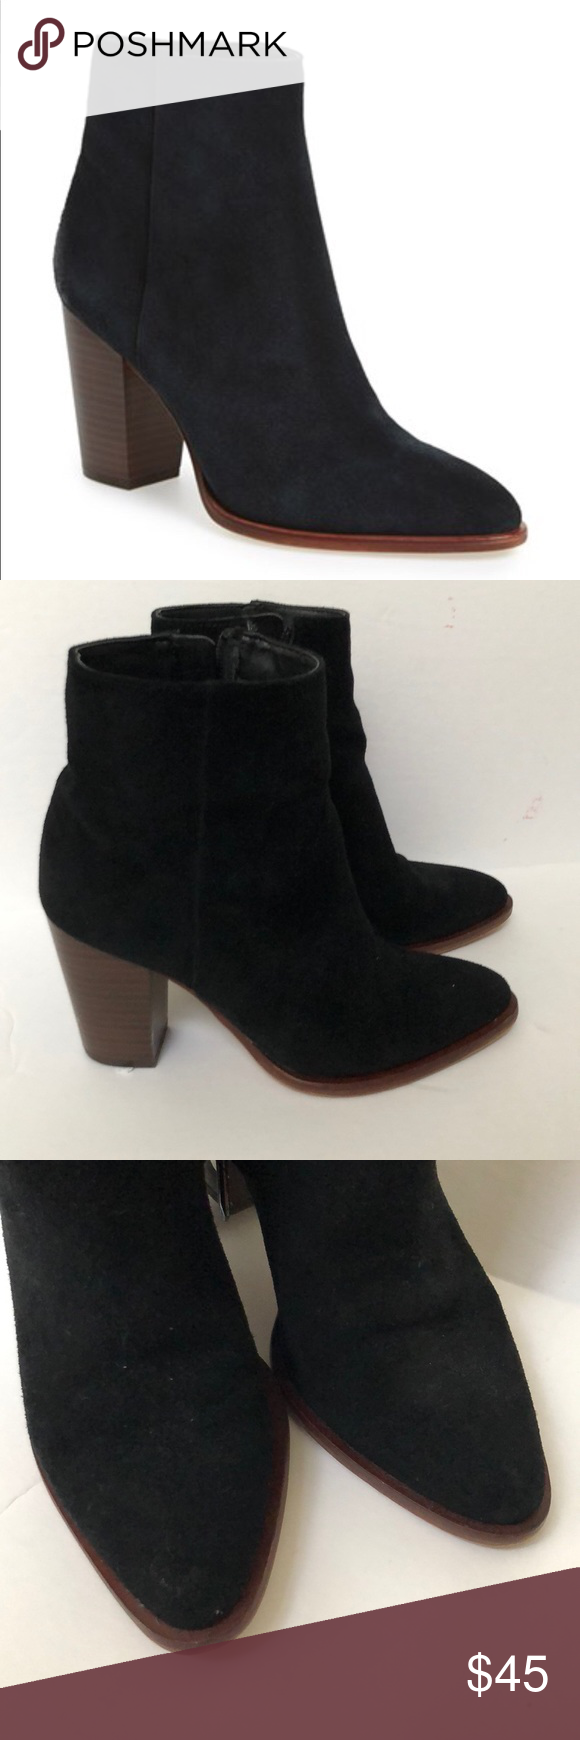 aaf3266edb45 Sam Edelman Blake Suede Black Ankle Boots Preowned